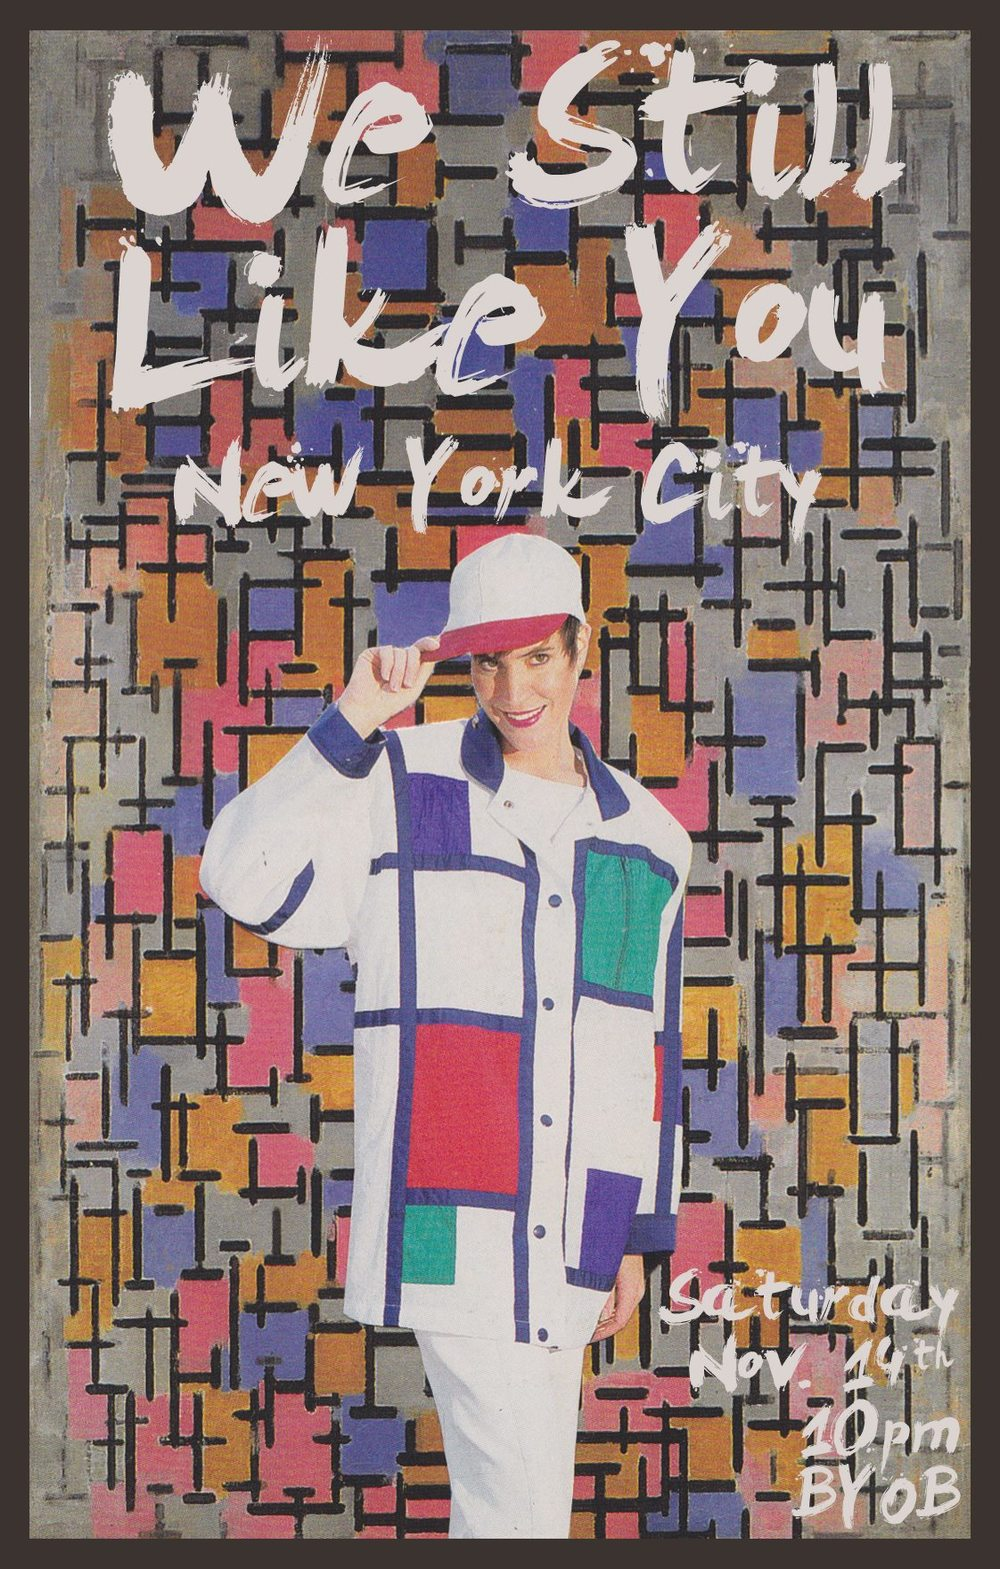 WSLY_NYC_2015.jpg